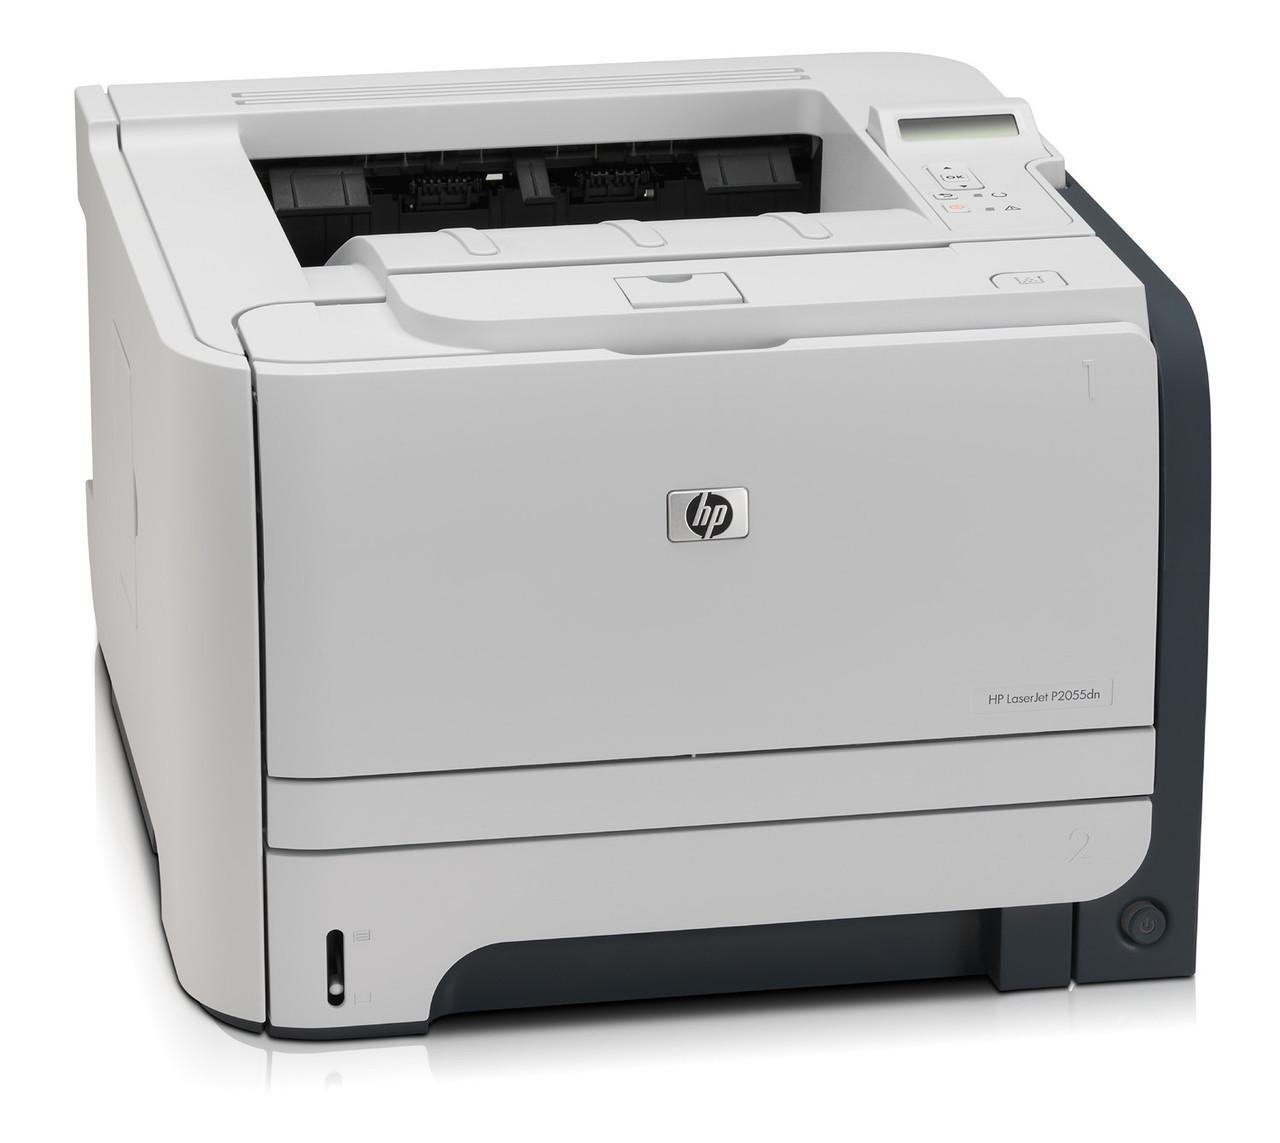 HP Laserjet P2055dn - CE459AR - HP Laser Printer for sale